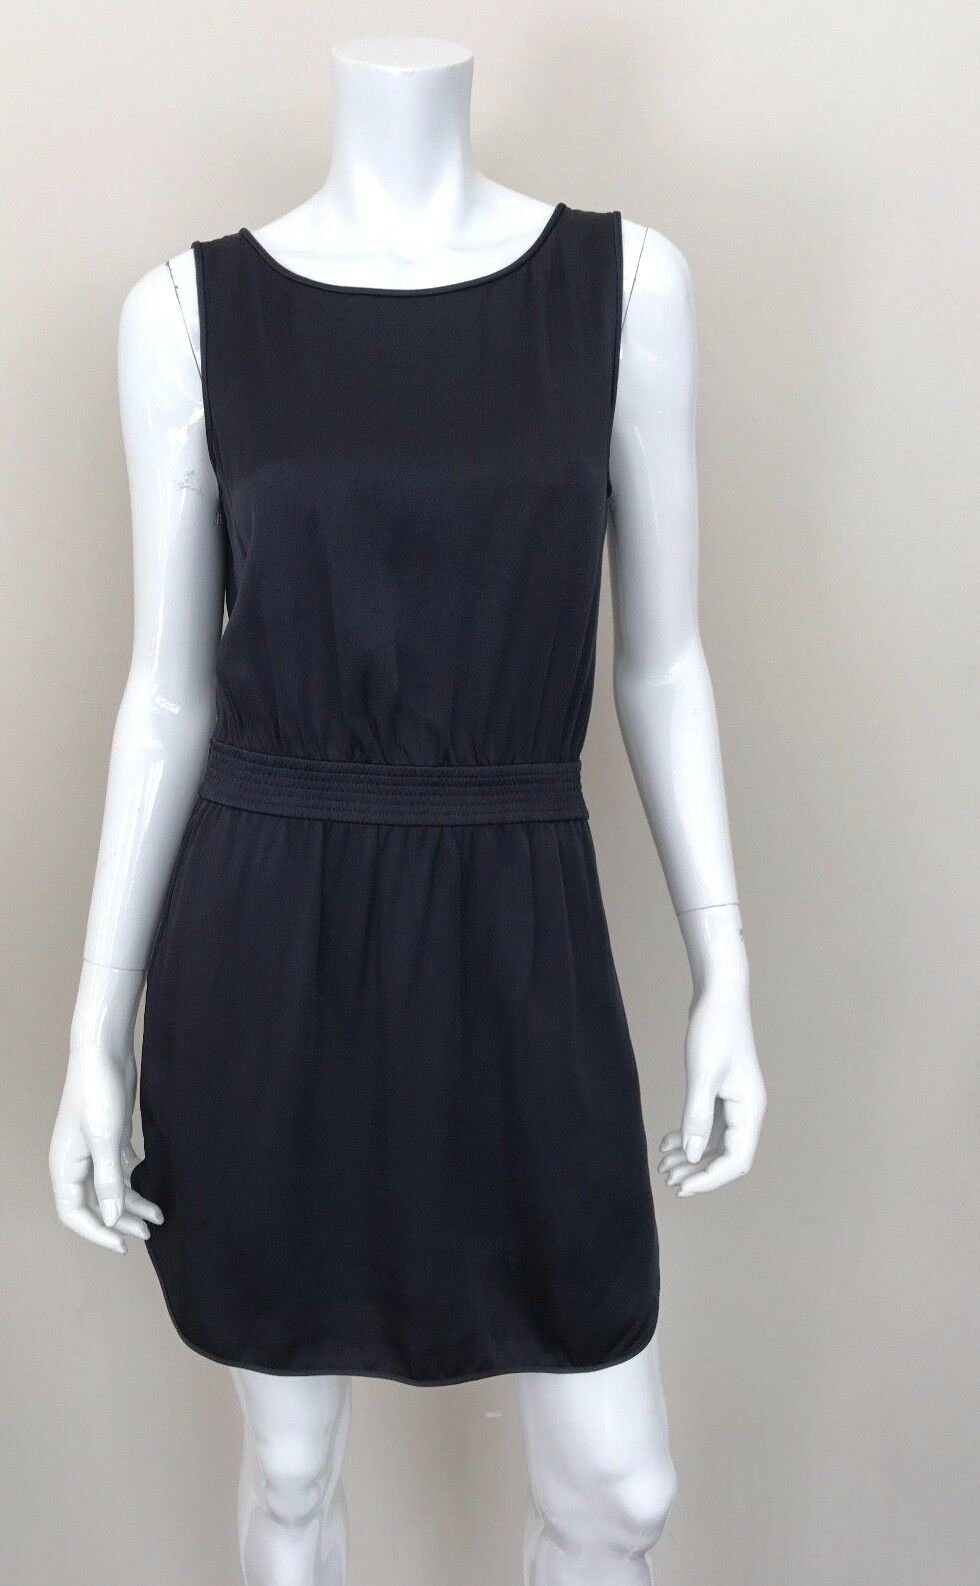 THEORY New Navy Short Dress wCinched Waist Sleeveless Größe Medium NWT